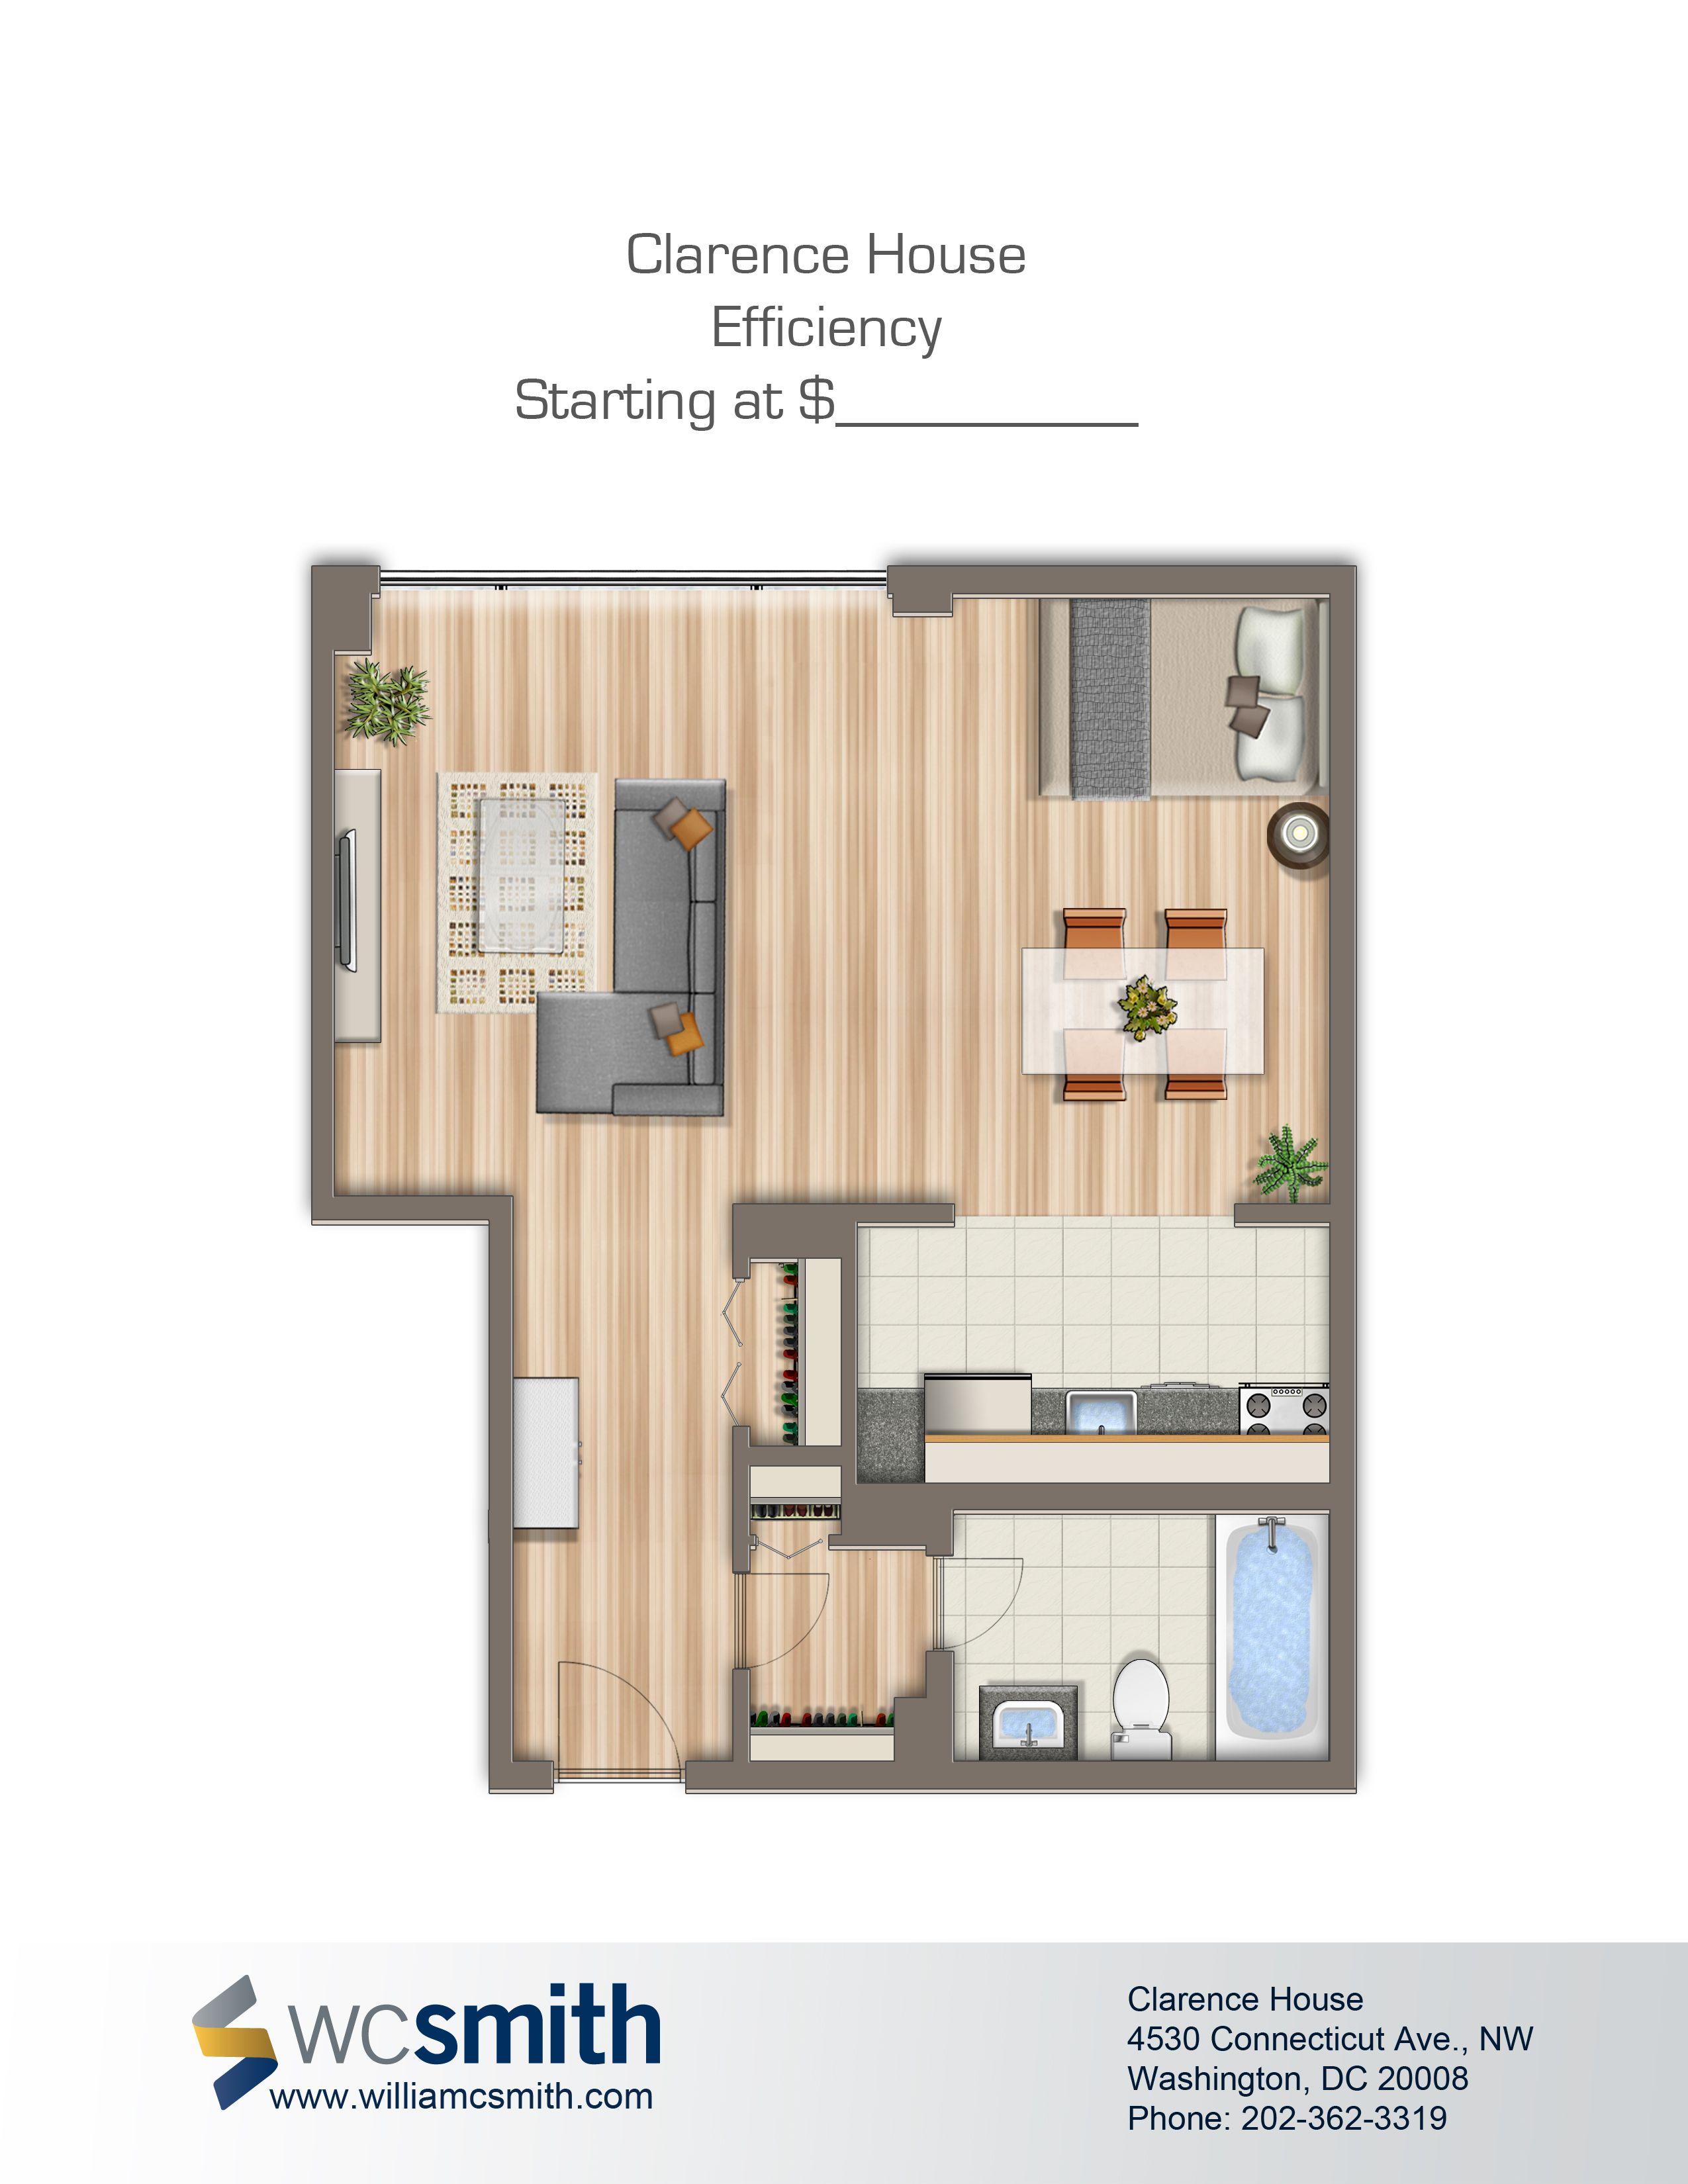 StudioEfficiency Floor Plan Clarence House in Northwest